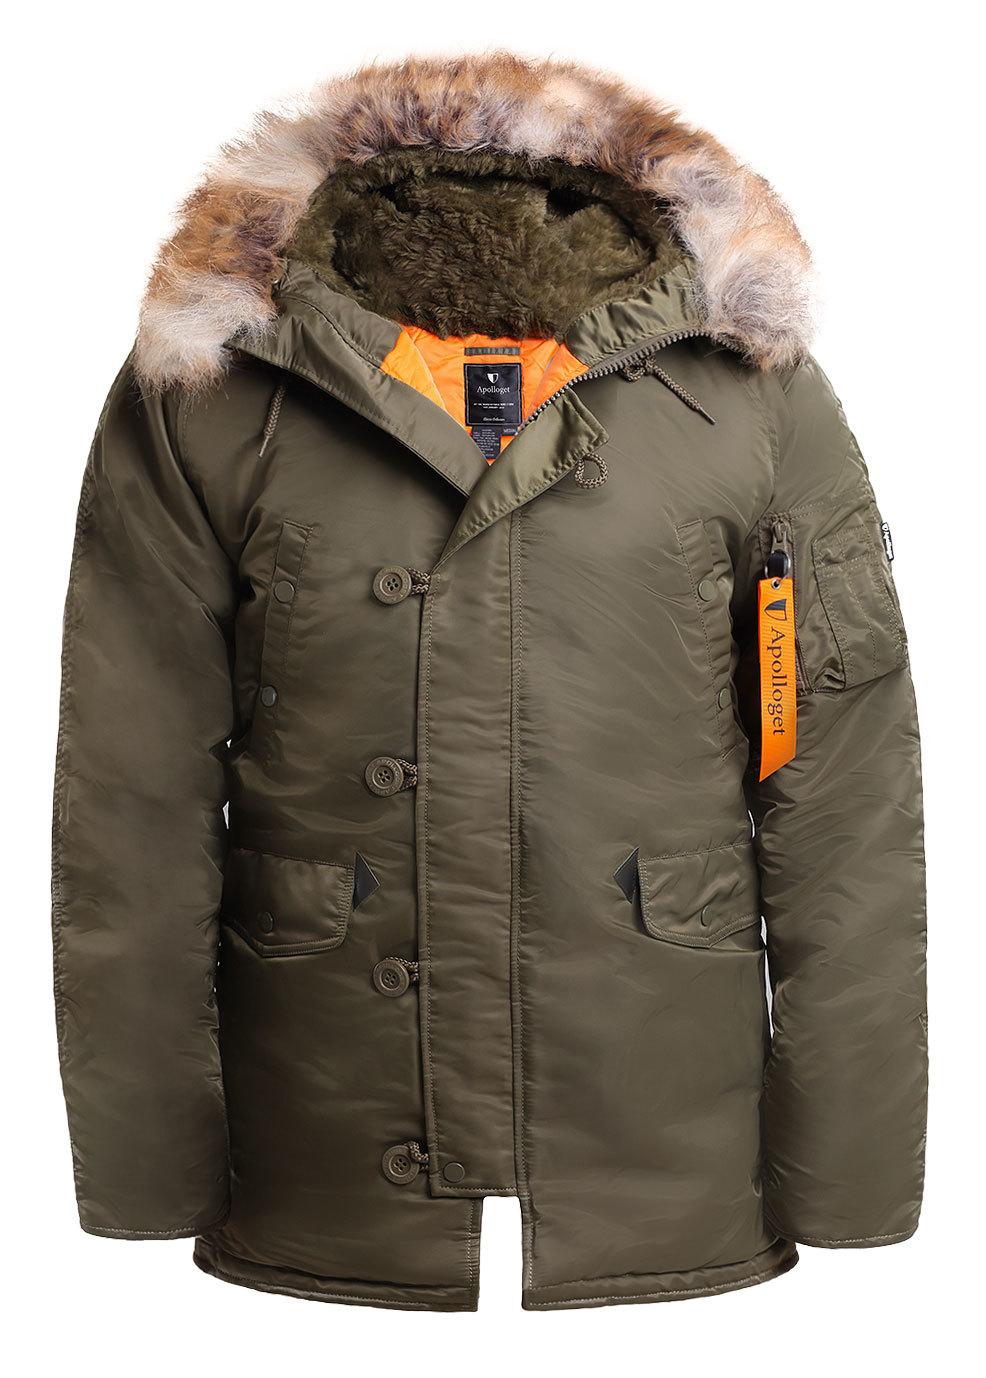 Куртка Аляска  N-3B  Husky Apolloget 2017 (зеленый - capers/orange)